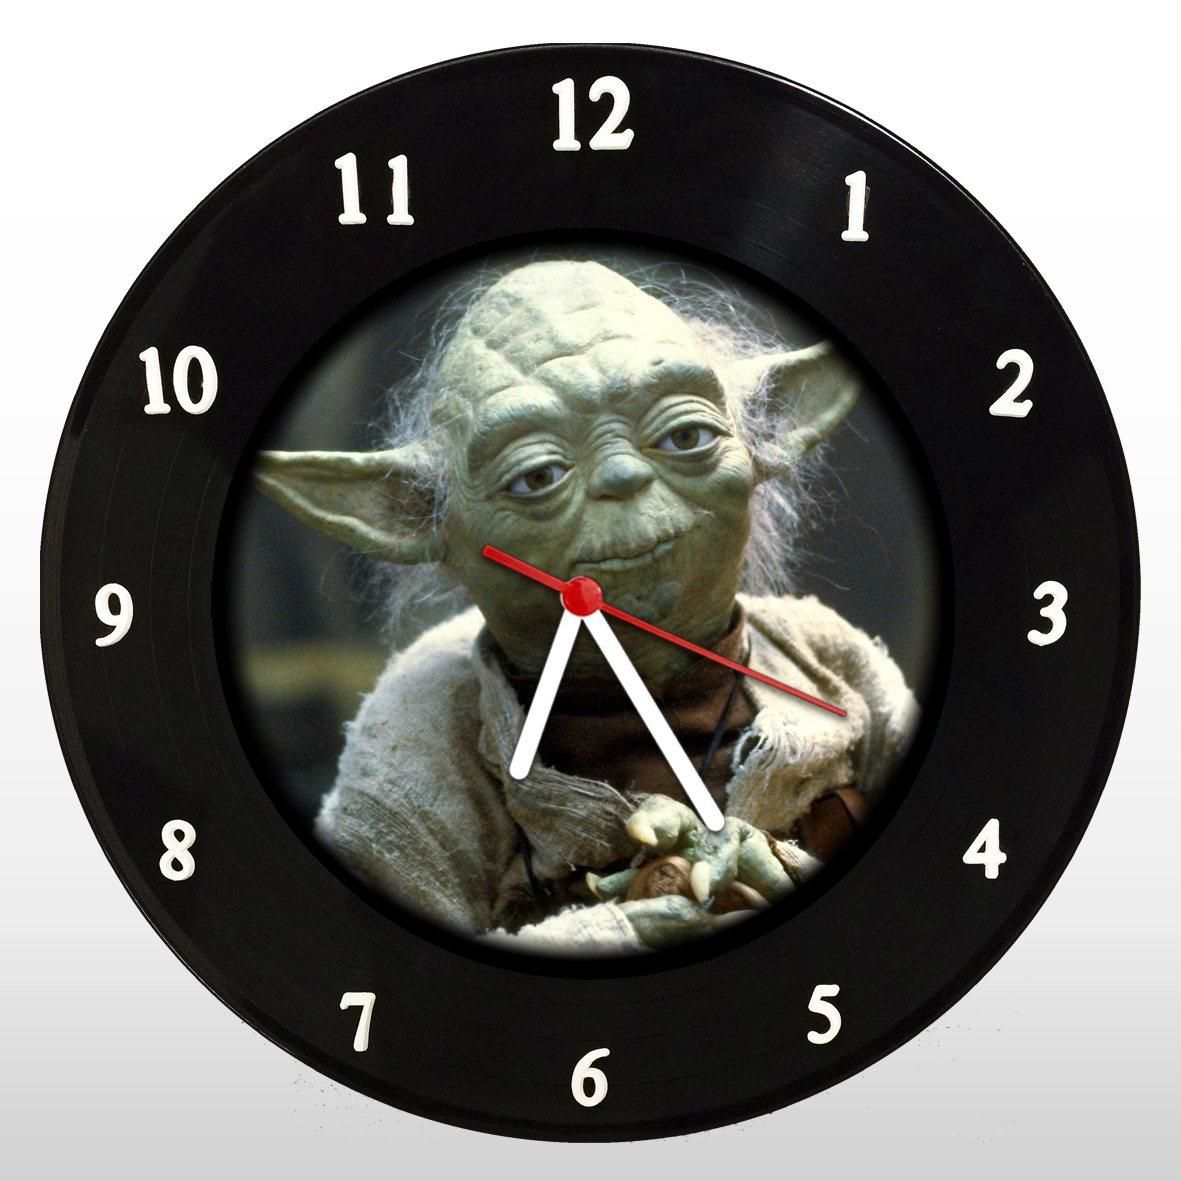 Star Wars - Guerra nas Estrelas - Yoda - Relógio em Vinil - Mr. Rock